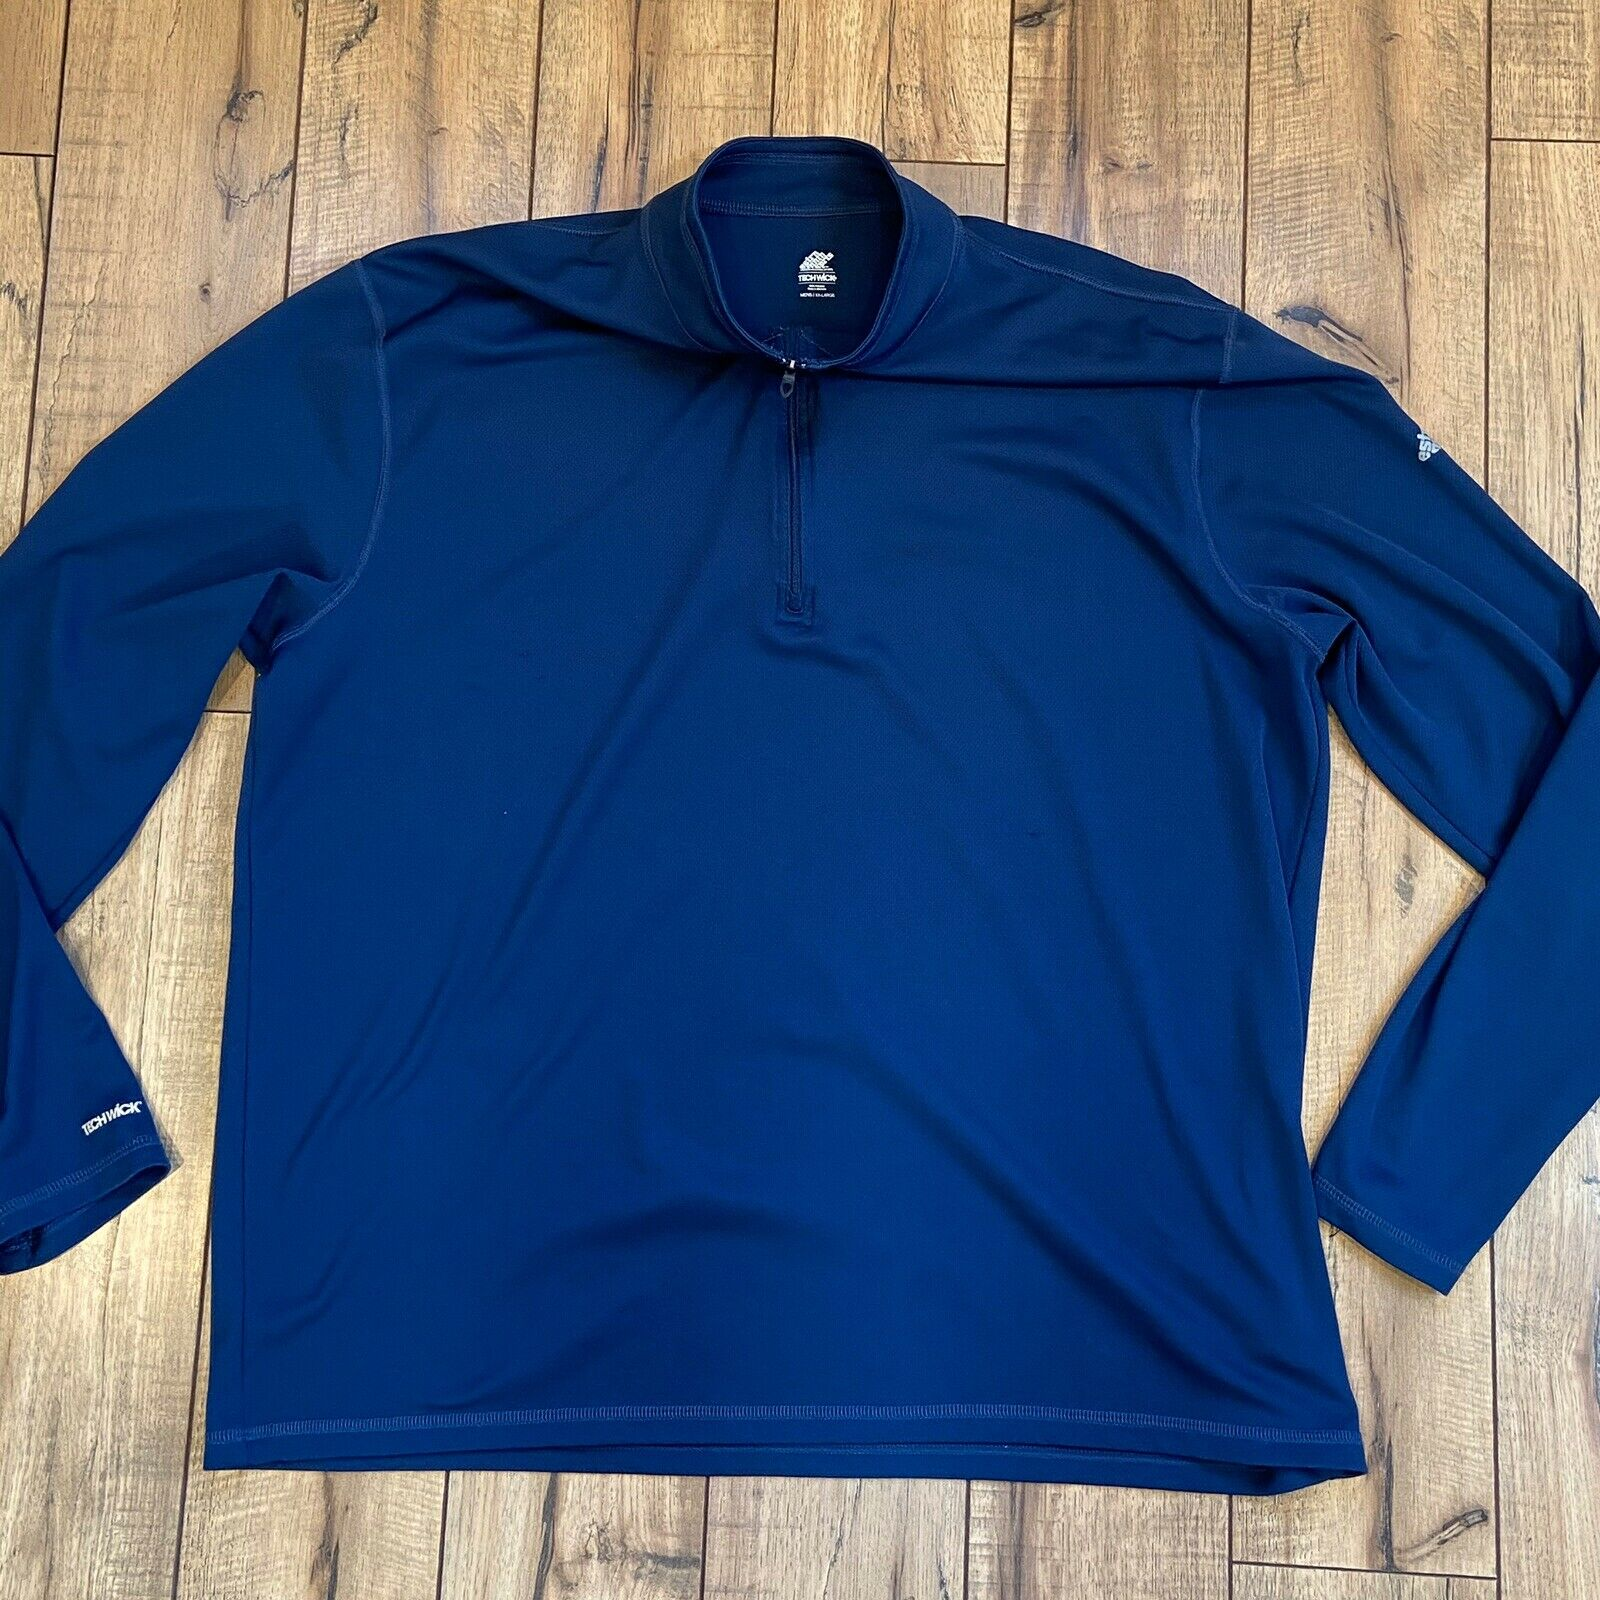 Eastern Mountain Sports EMS Techwick 1/4 zip Baselayer Blue Top Men's XXL